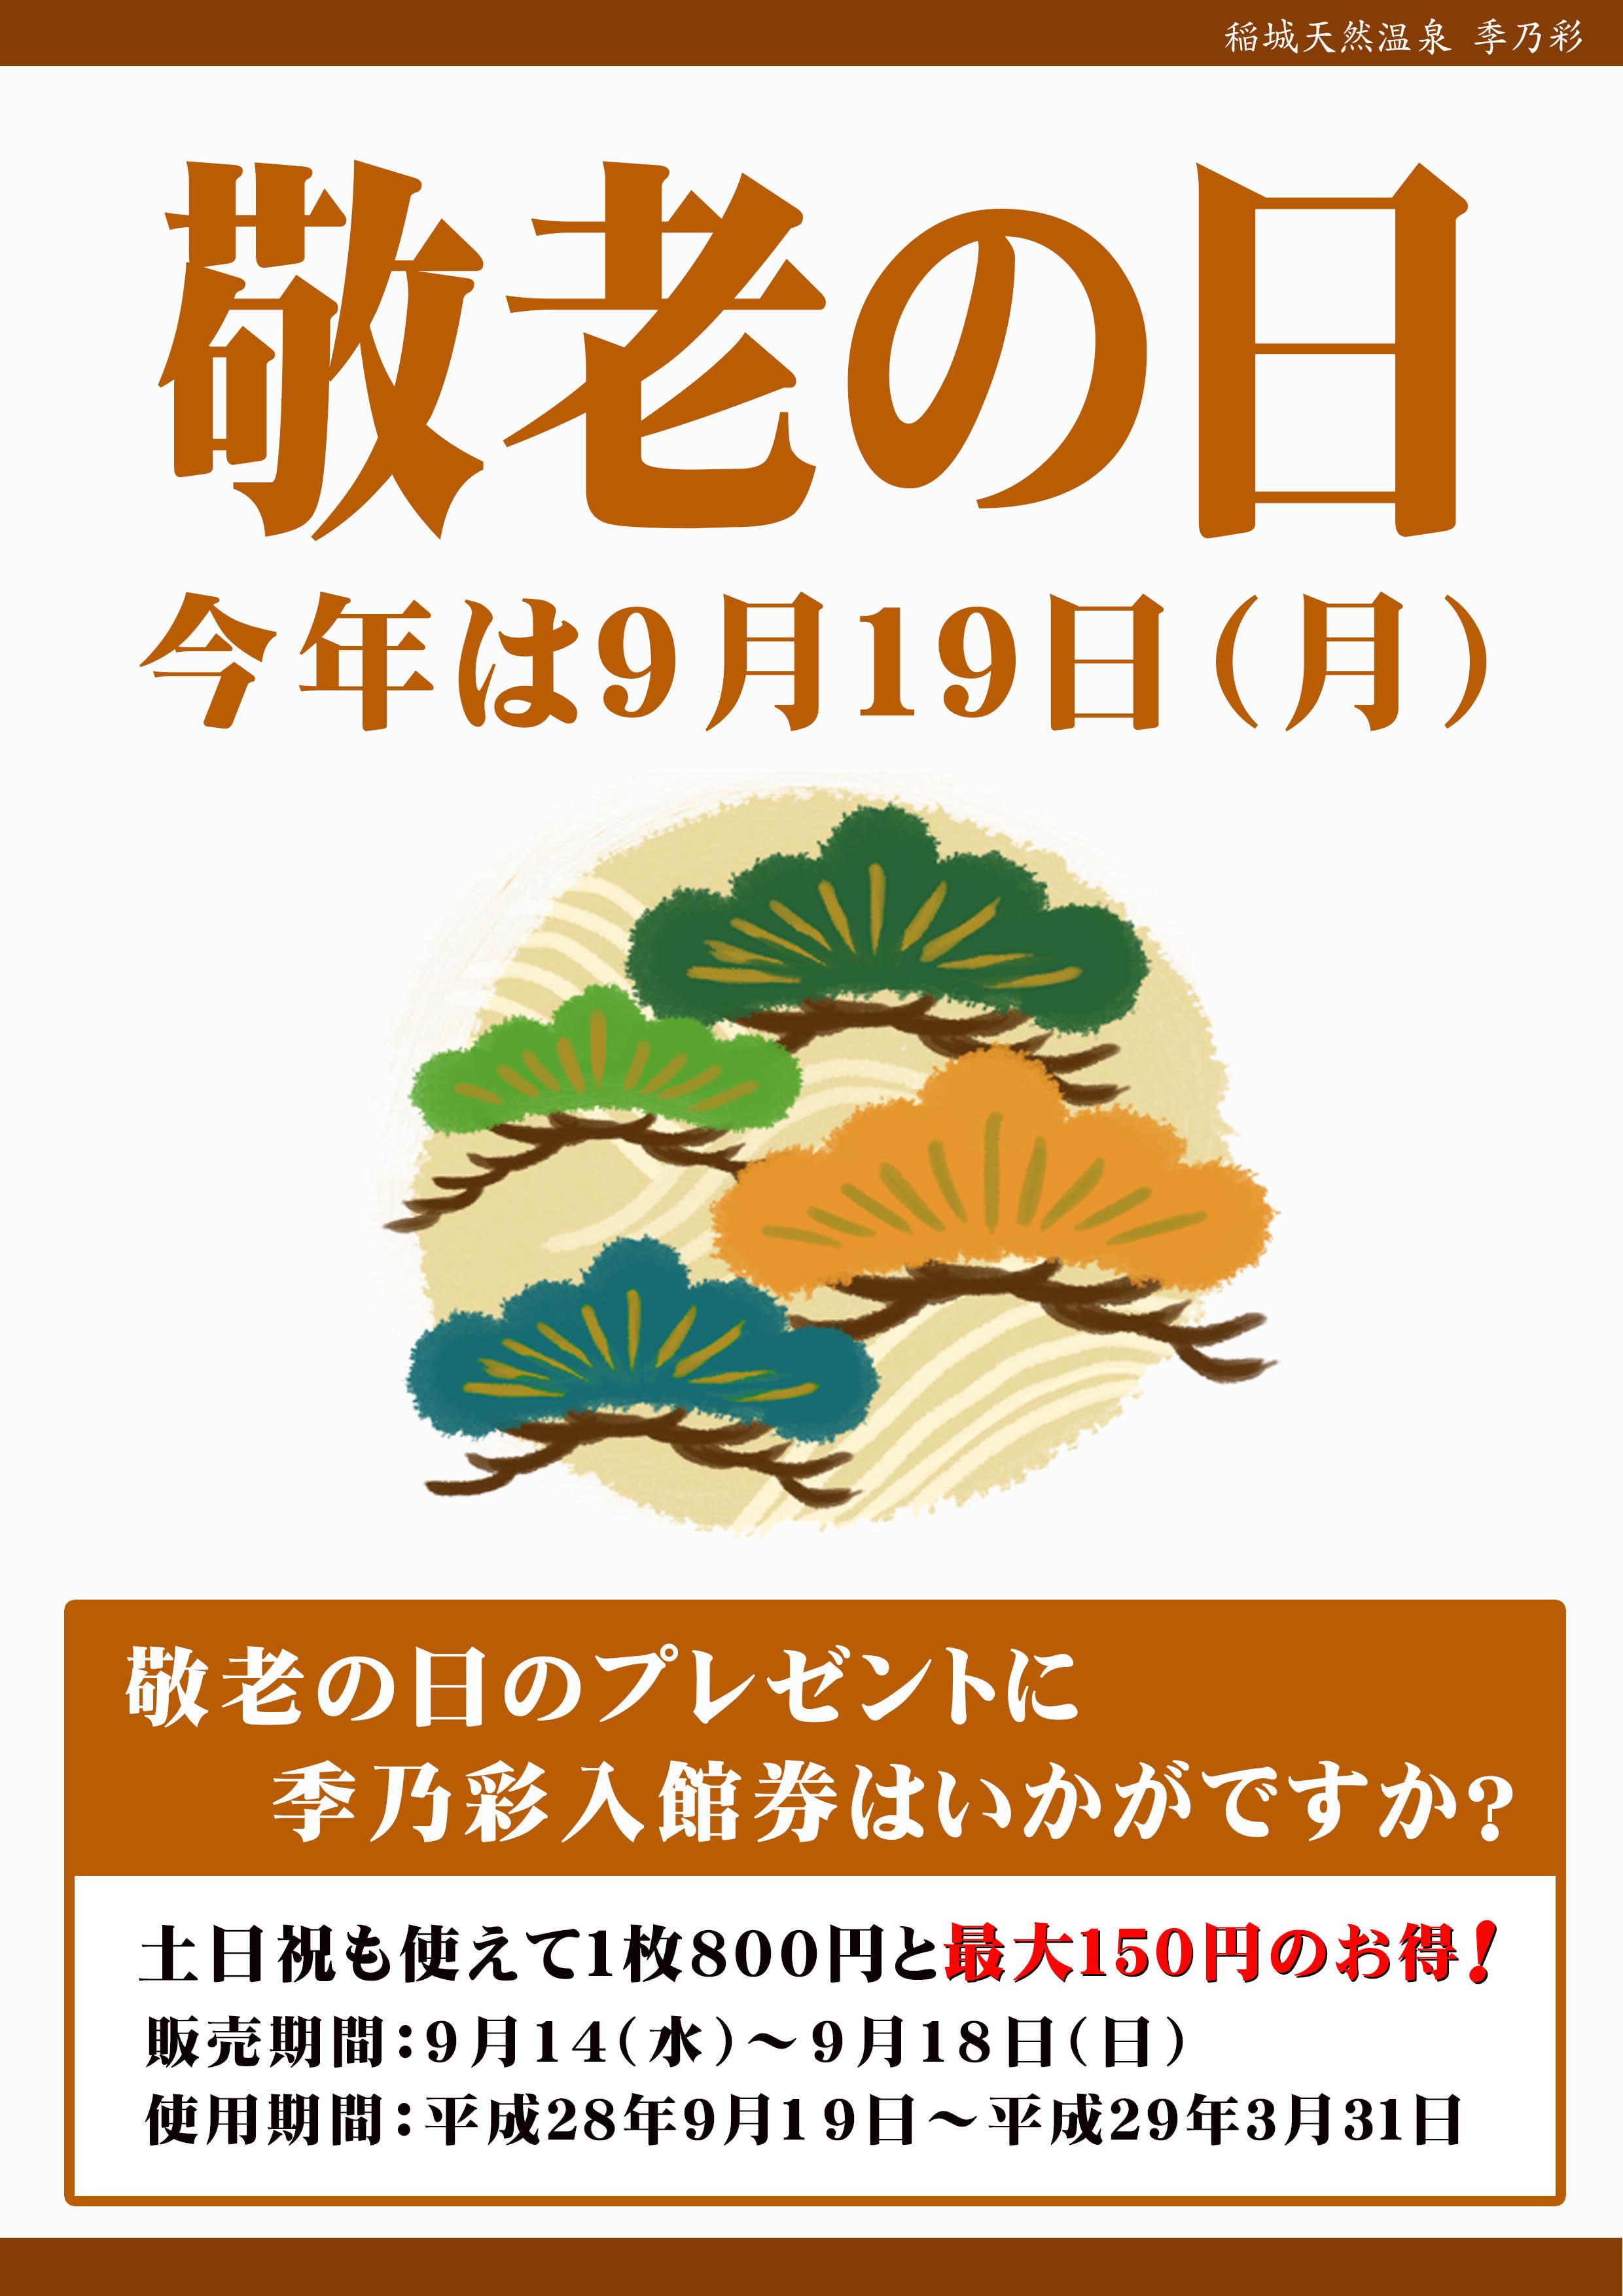 POP イベント 9月 敬老の日 入館券販売2016